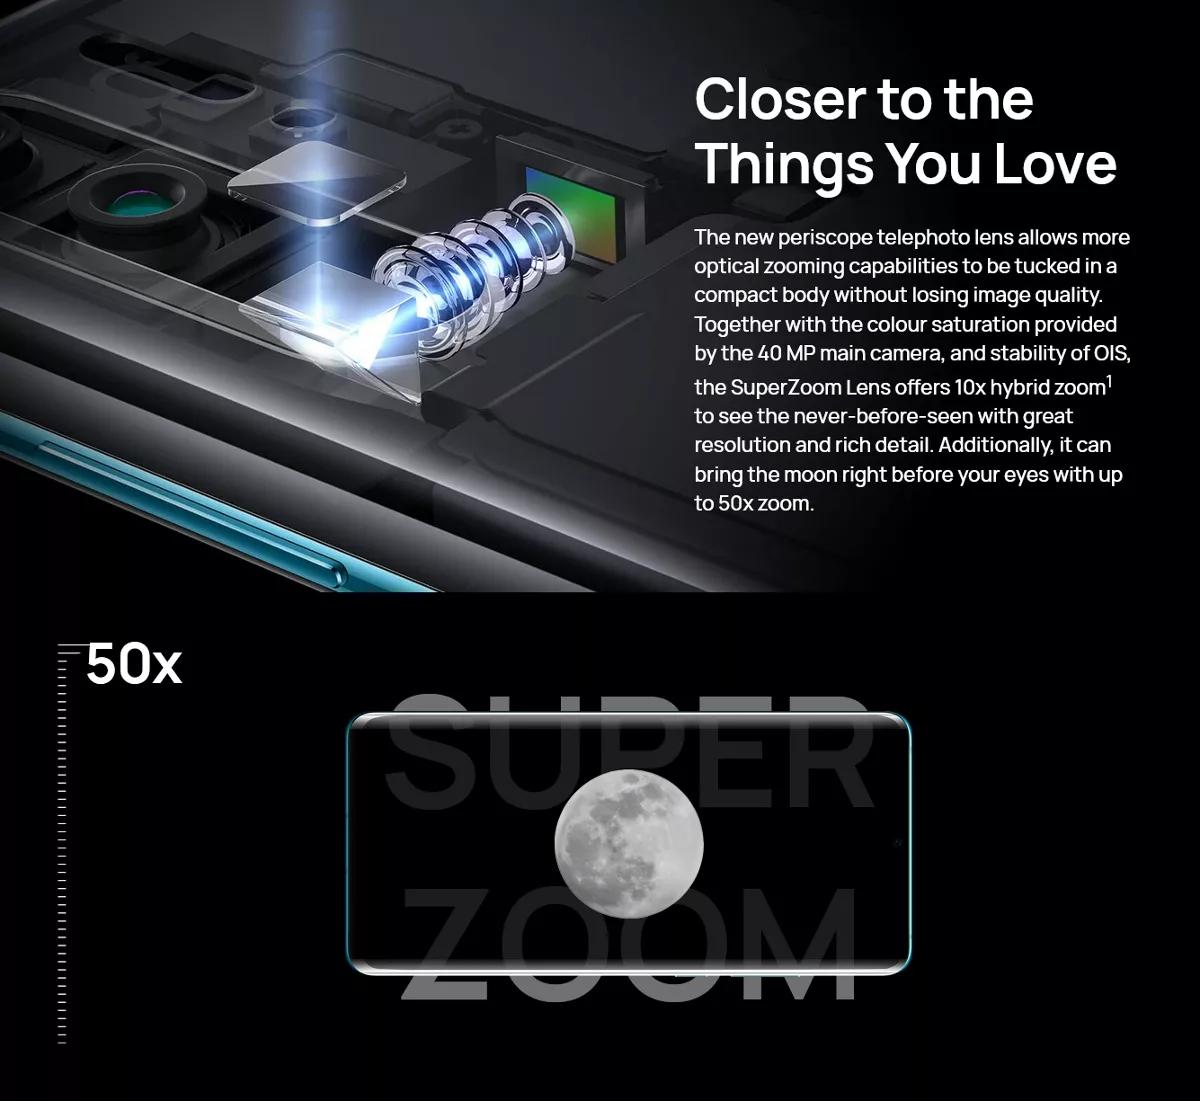 HUAWEI P30 Pro 6.47 inch 40MP Quad Rear Camera Wireless Charge 8GB RAM Kirin 980 Octa core 4G Smartphone